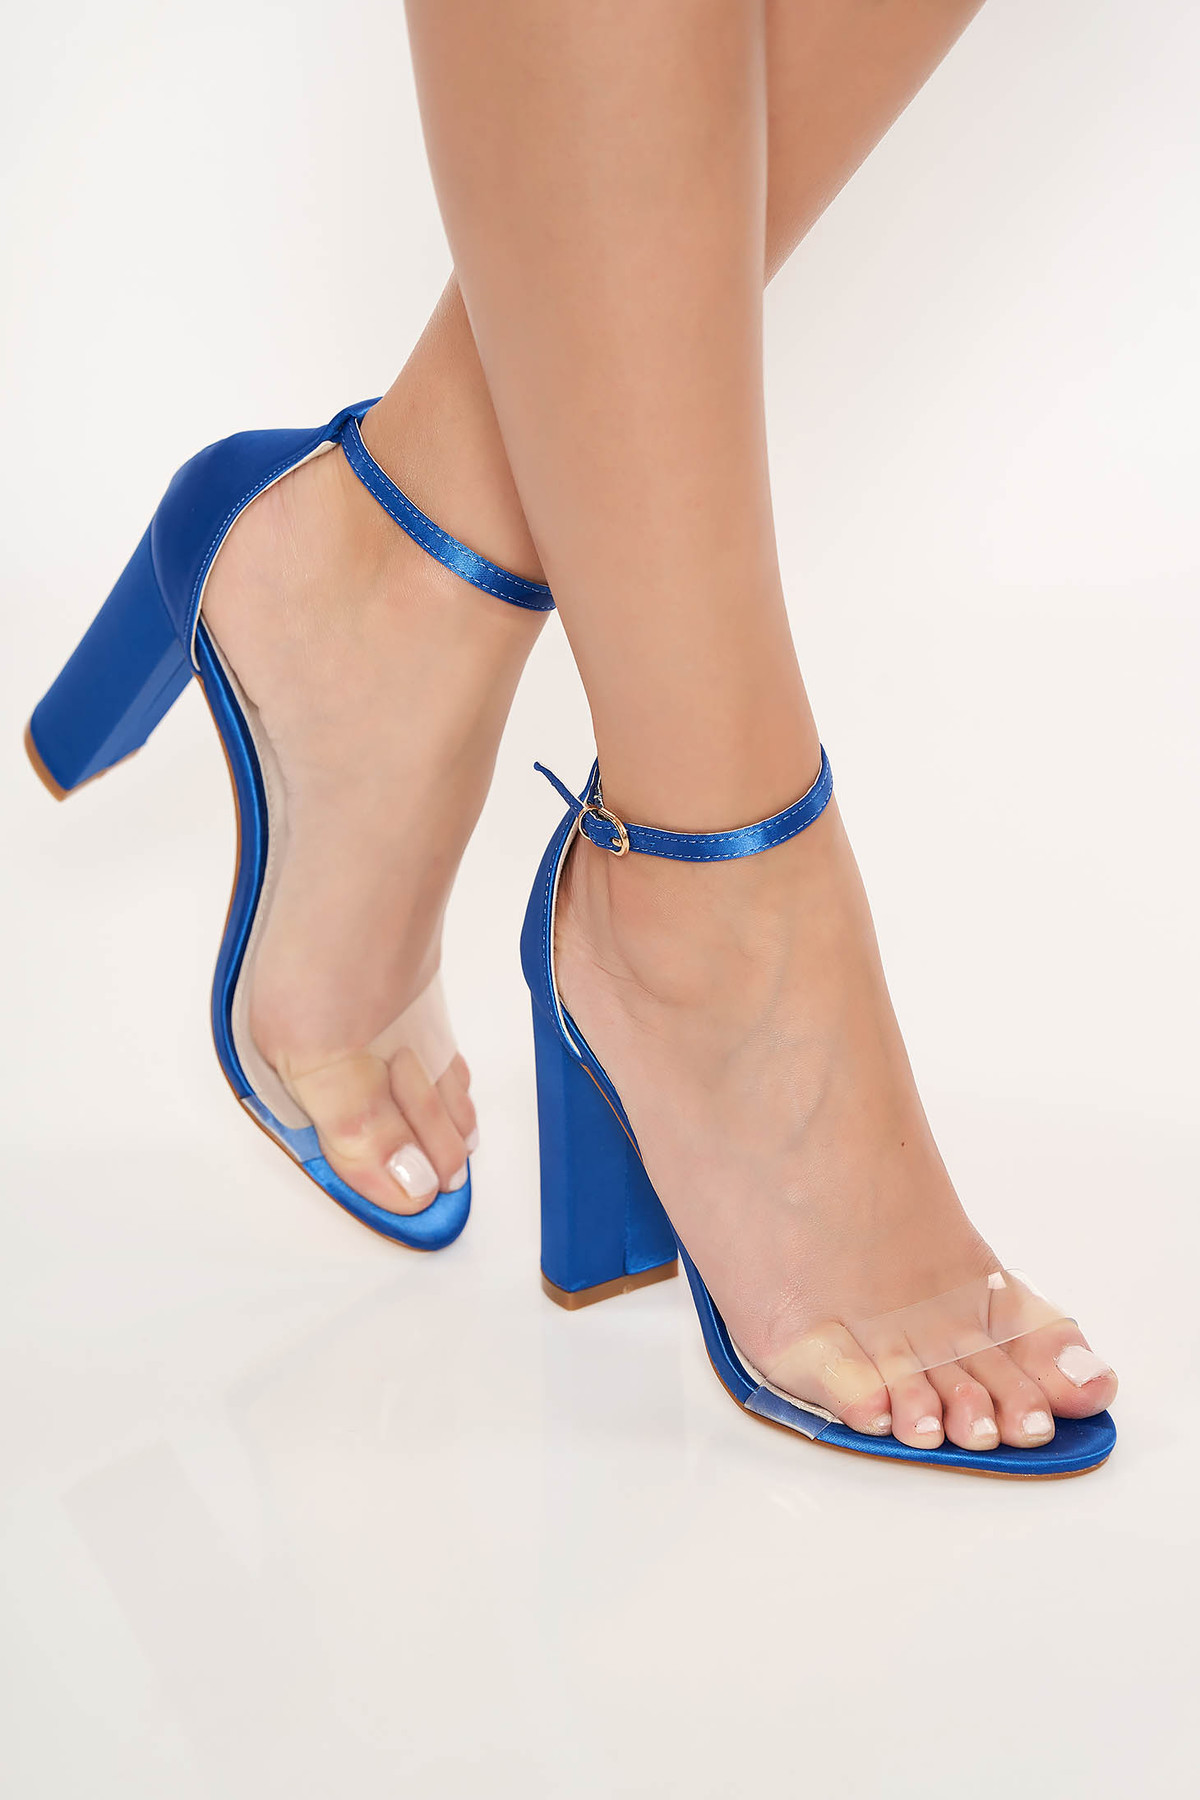 Sandale albastre elegante din piele ecologica cu barete subtiri si toc gros